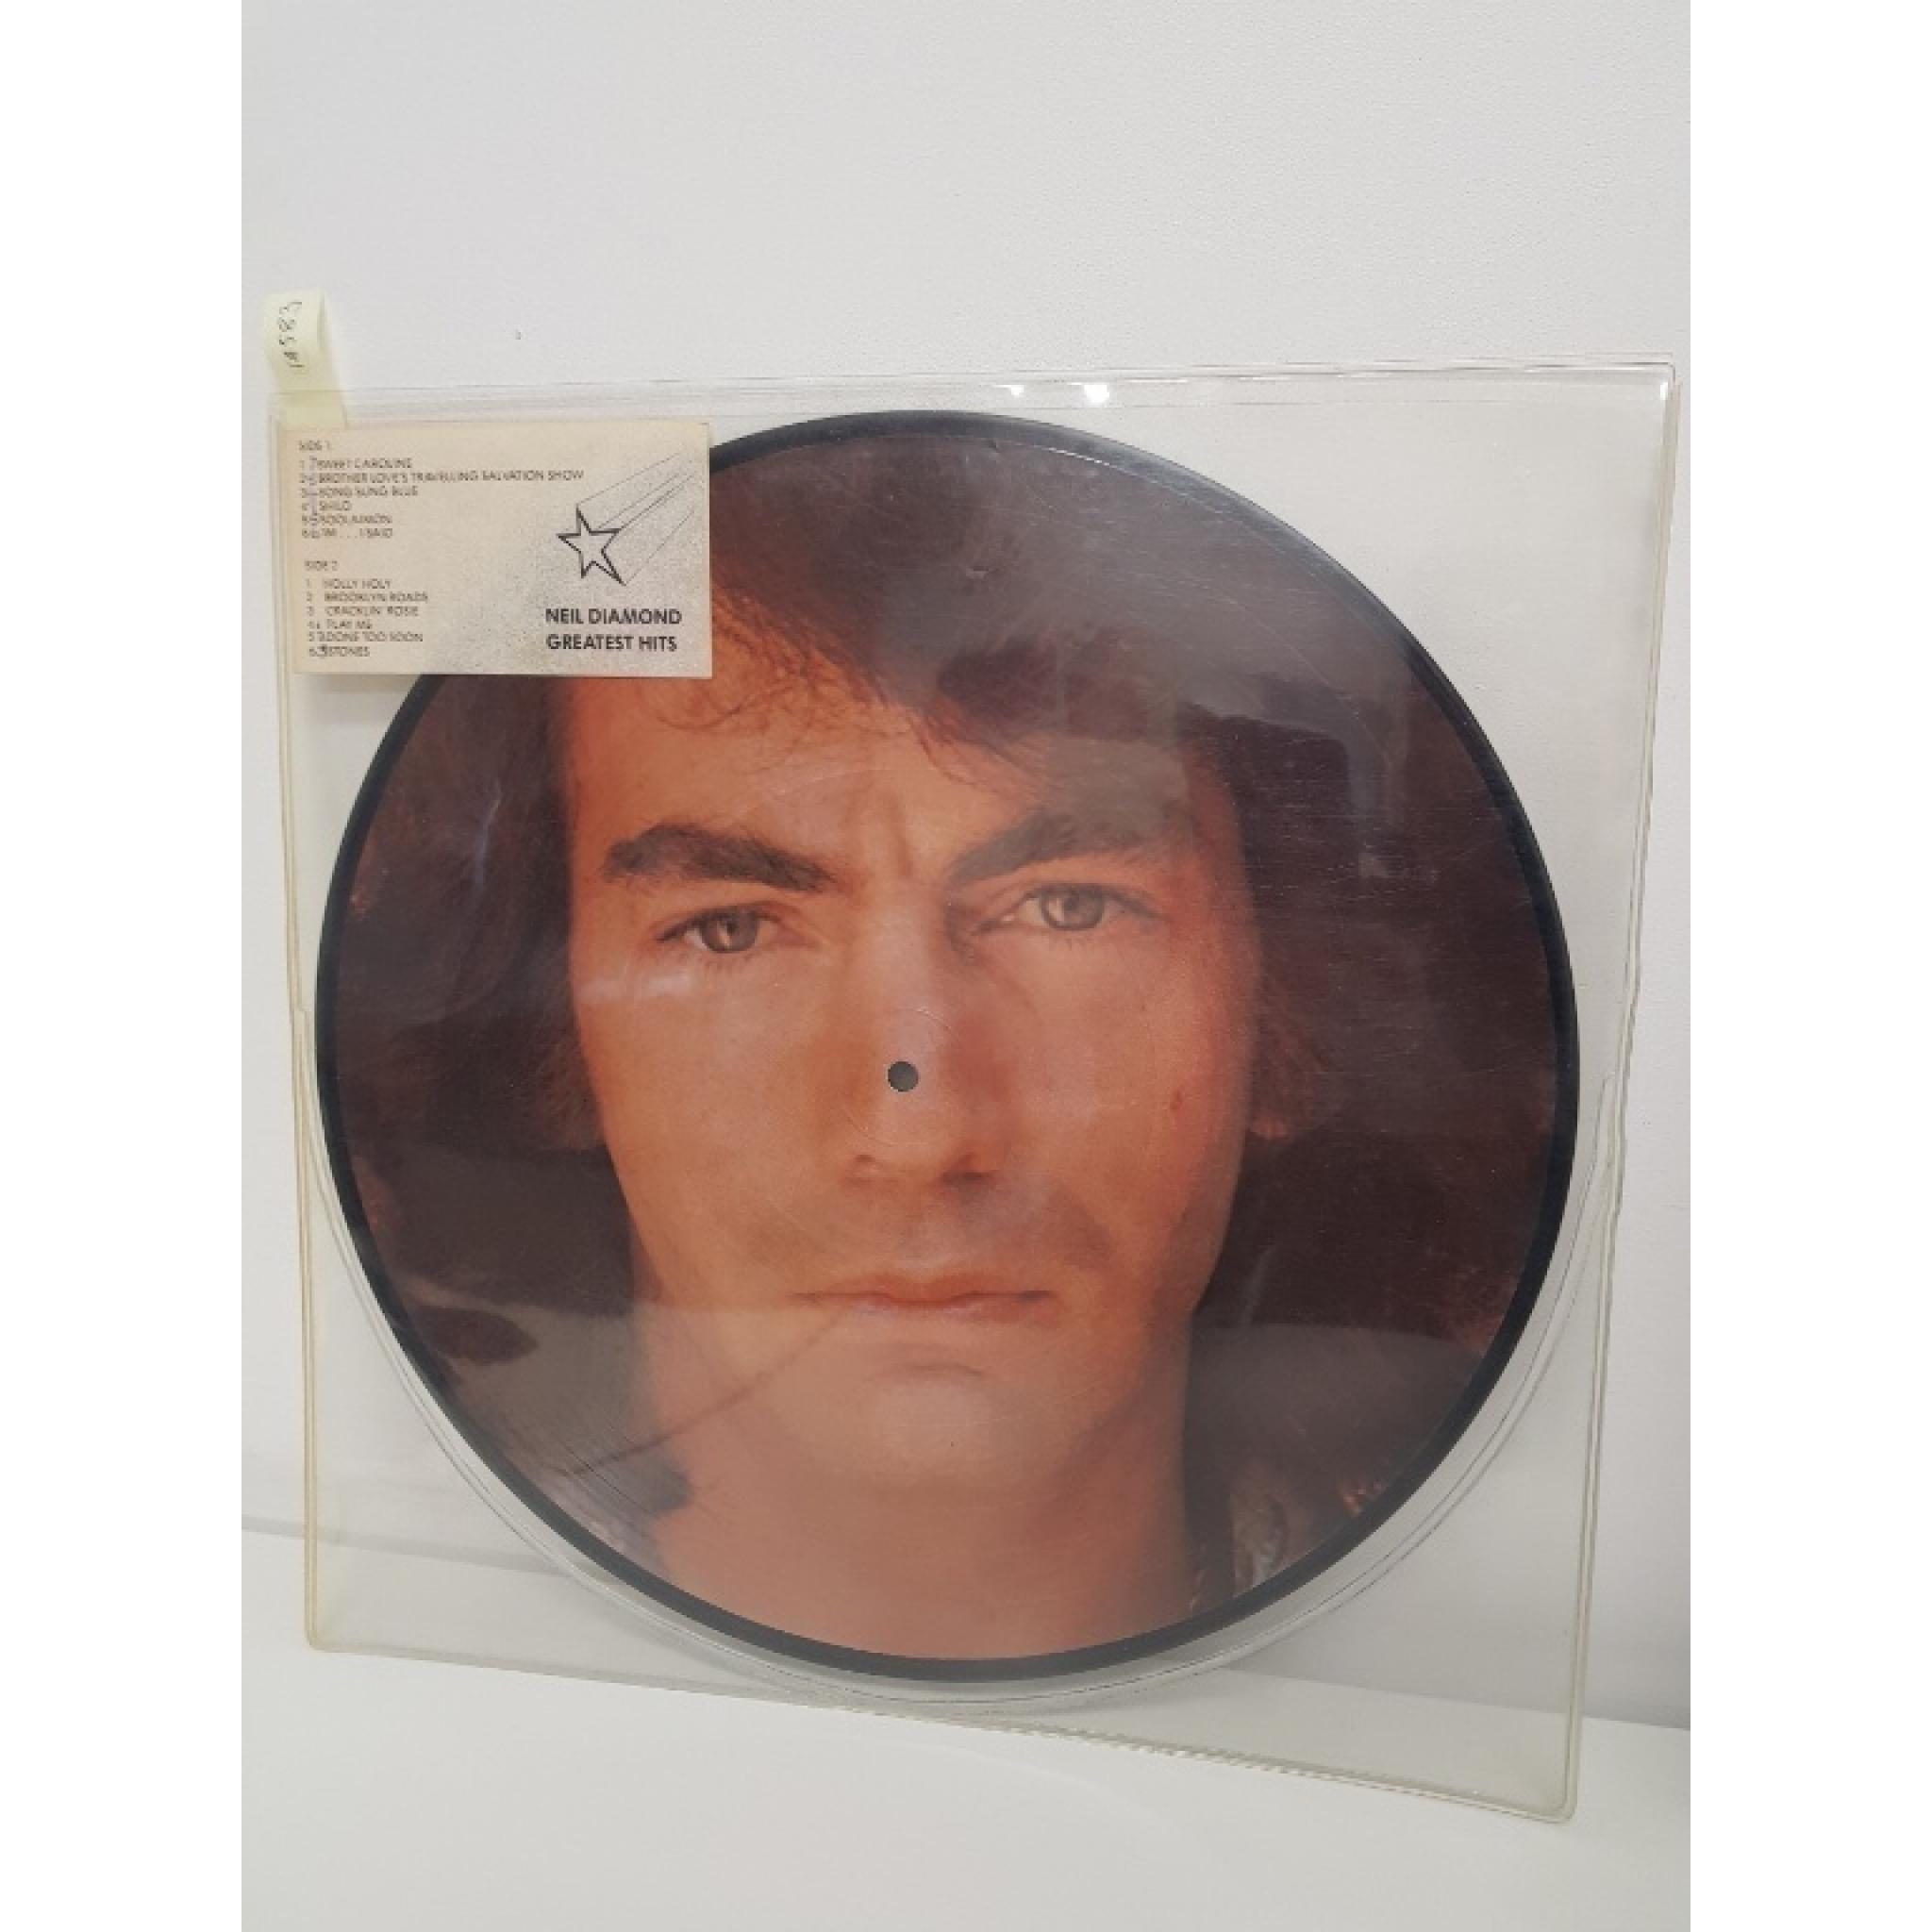 Neil Diamond His 12 Greatest Hits Picture Disc 5c P062 95373 12 Lp